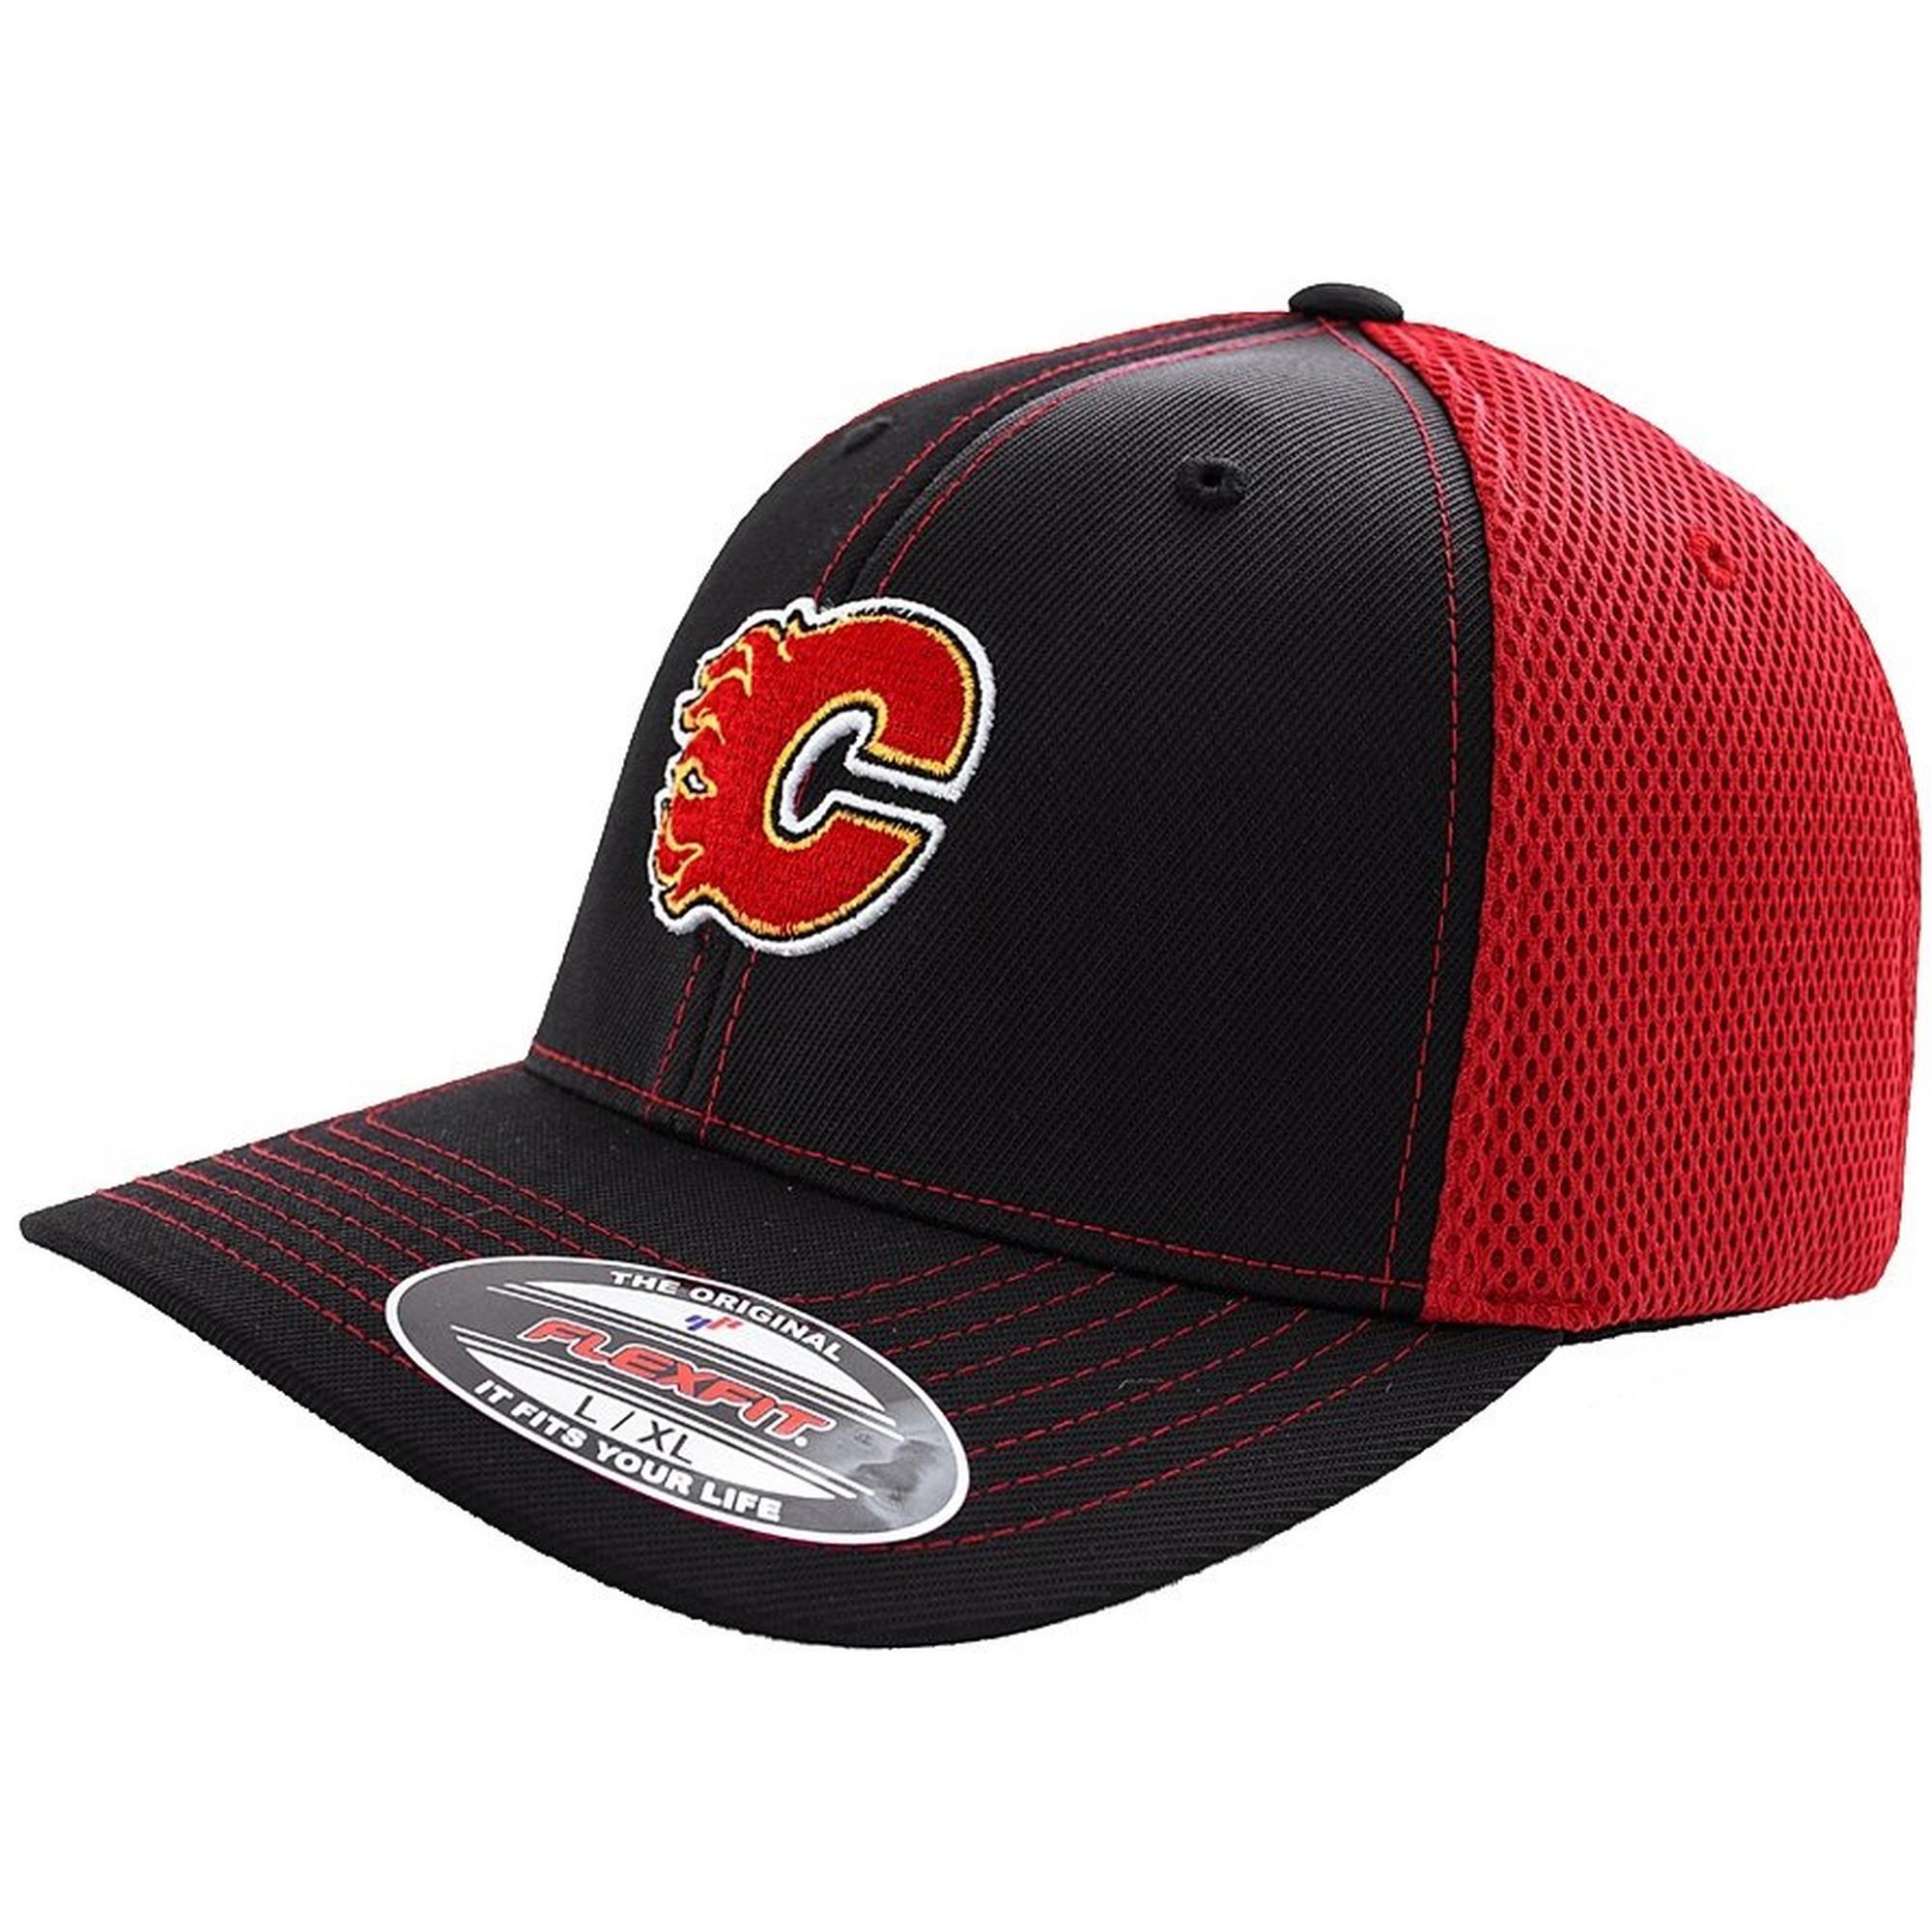 Men's Ultramesh Calgary Flames Cap